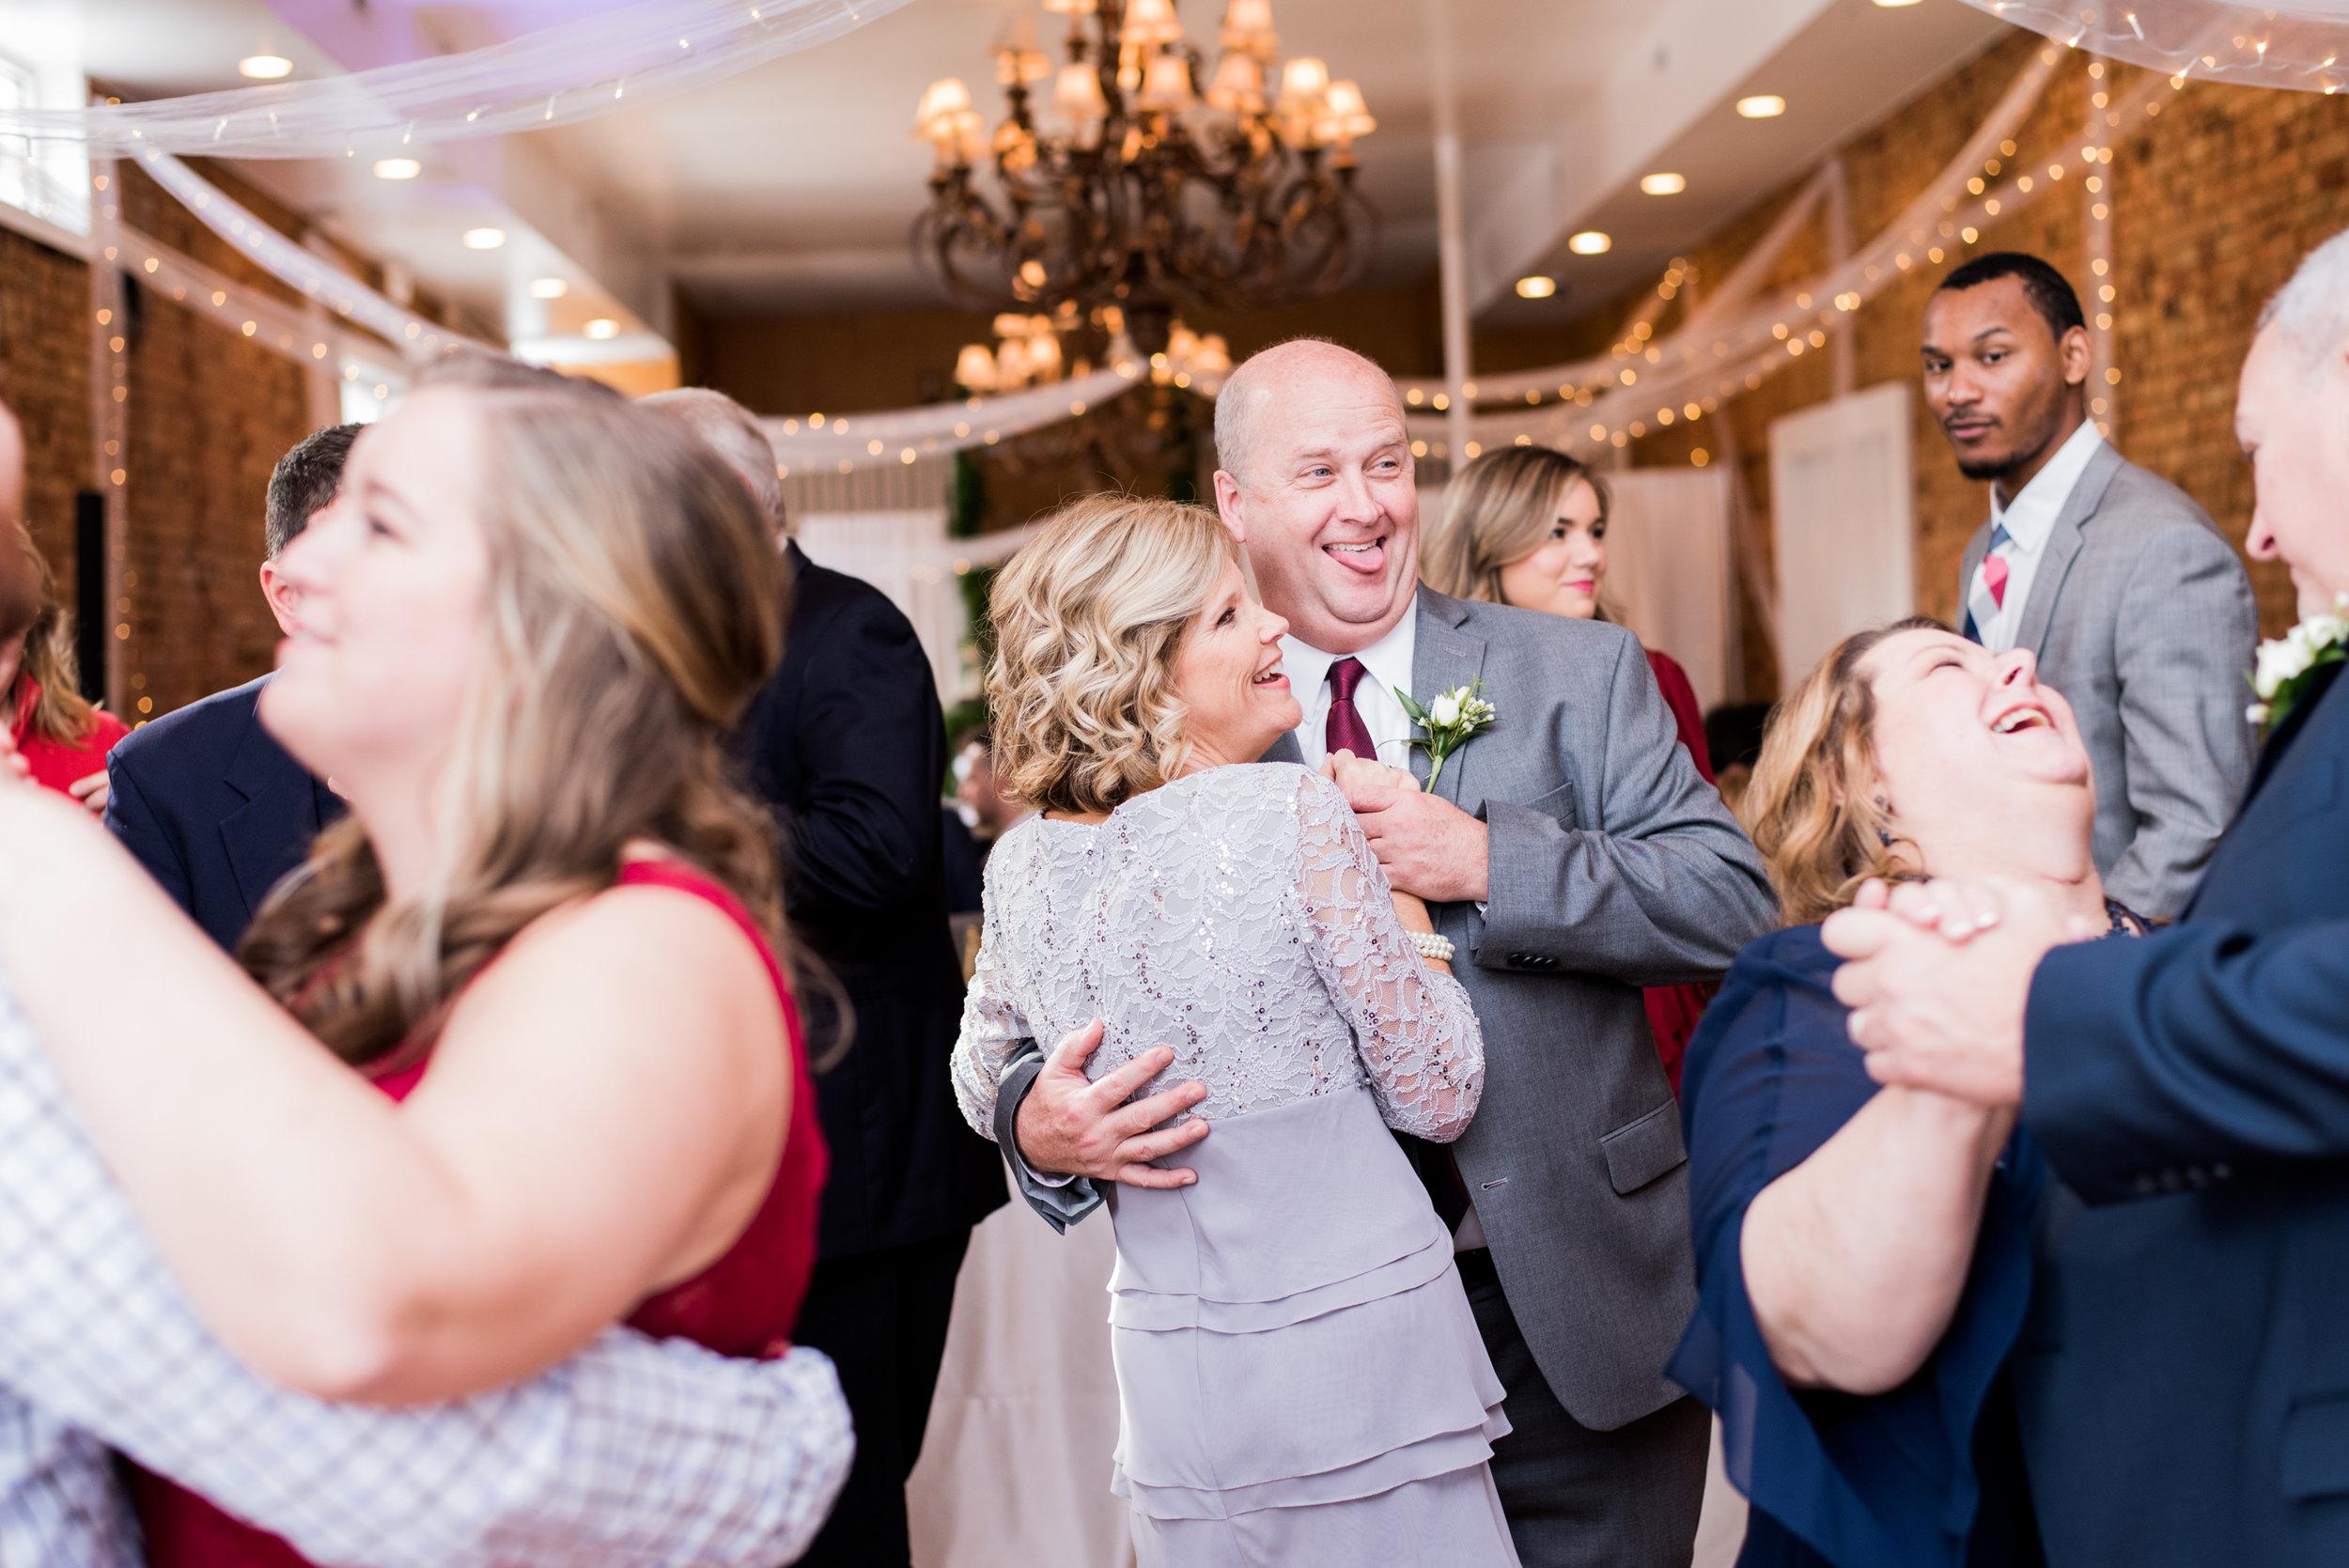 Kasey + Dillon: Elegant Hometown Wedding at the Davenport, Greer, South Carolina   Palmetto State Weddings